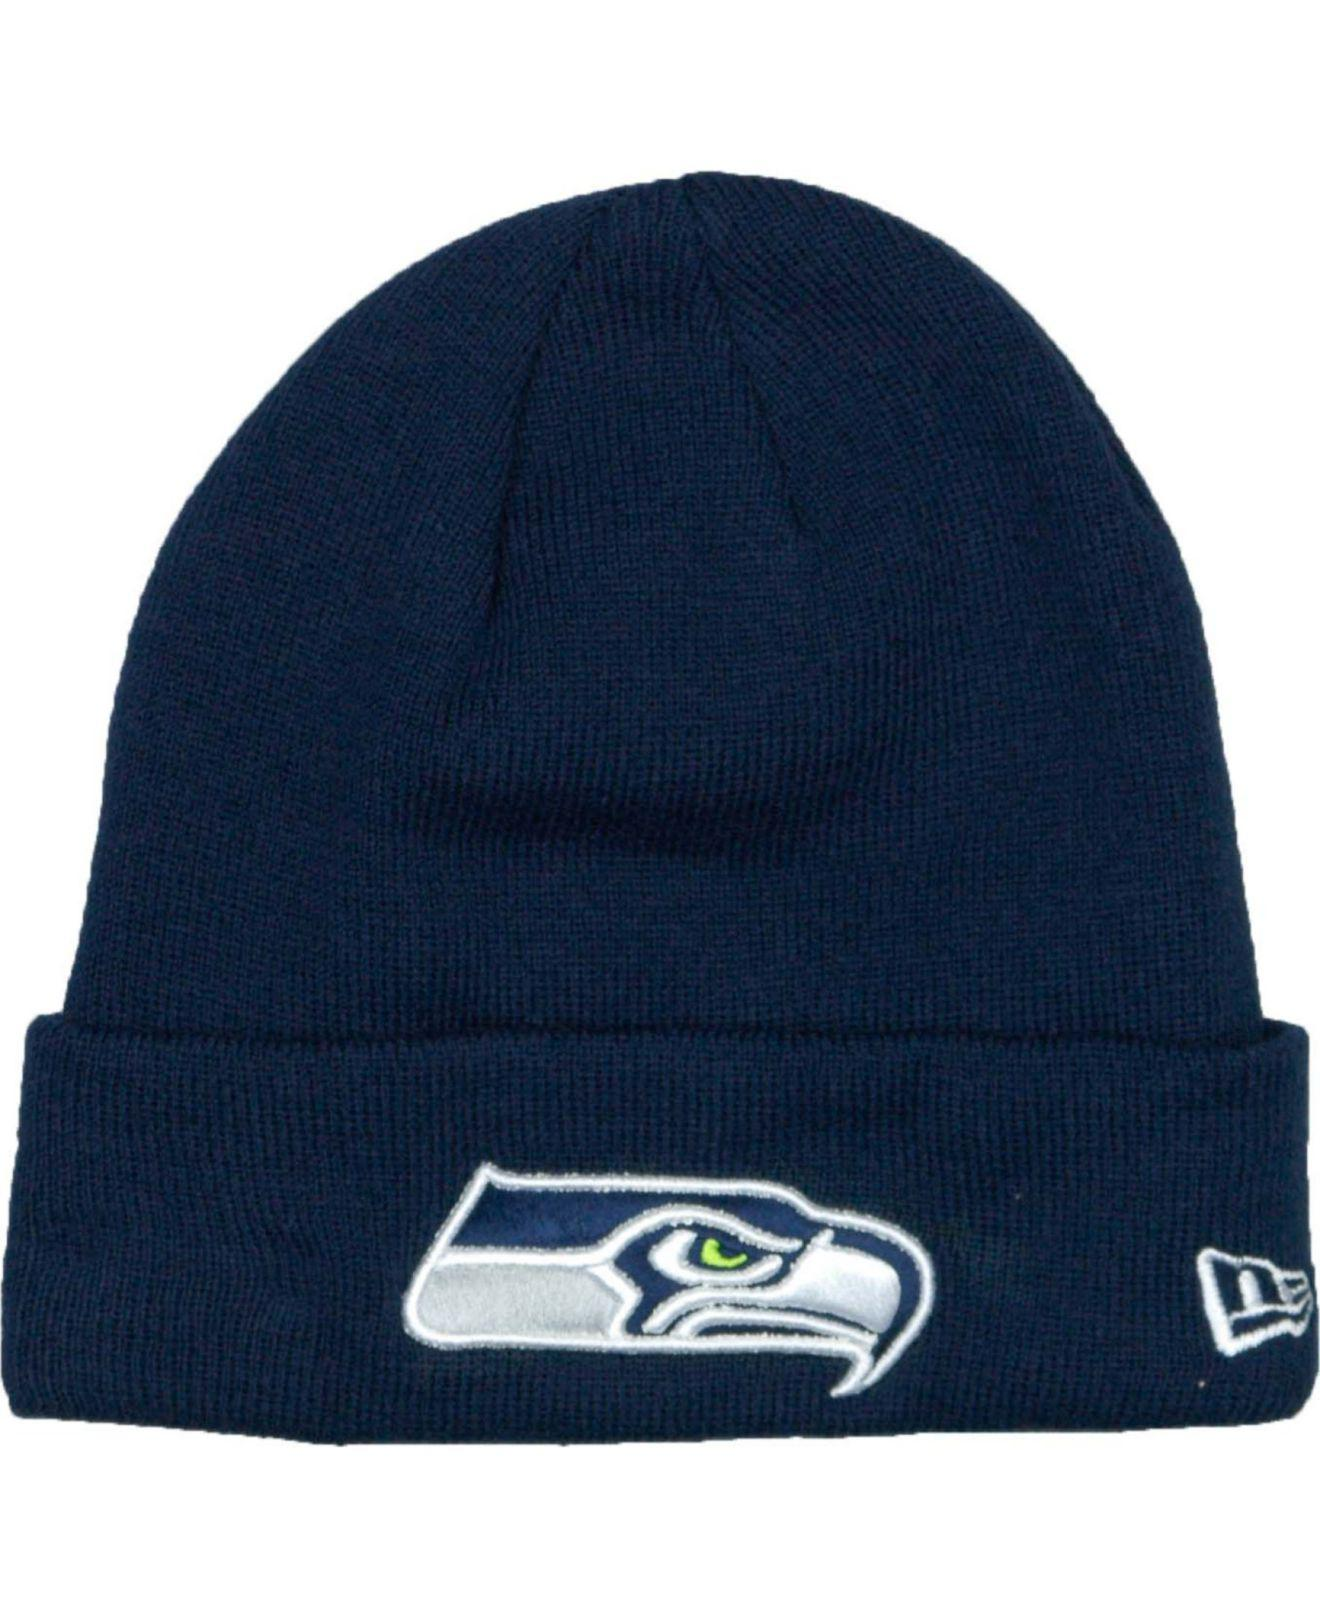 1ce6c0f49c7c3 Lyst - KTZ Seattle Seahawks Basic Cuff Knit Hat in Blue for Men